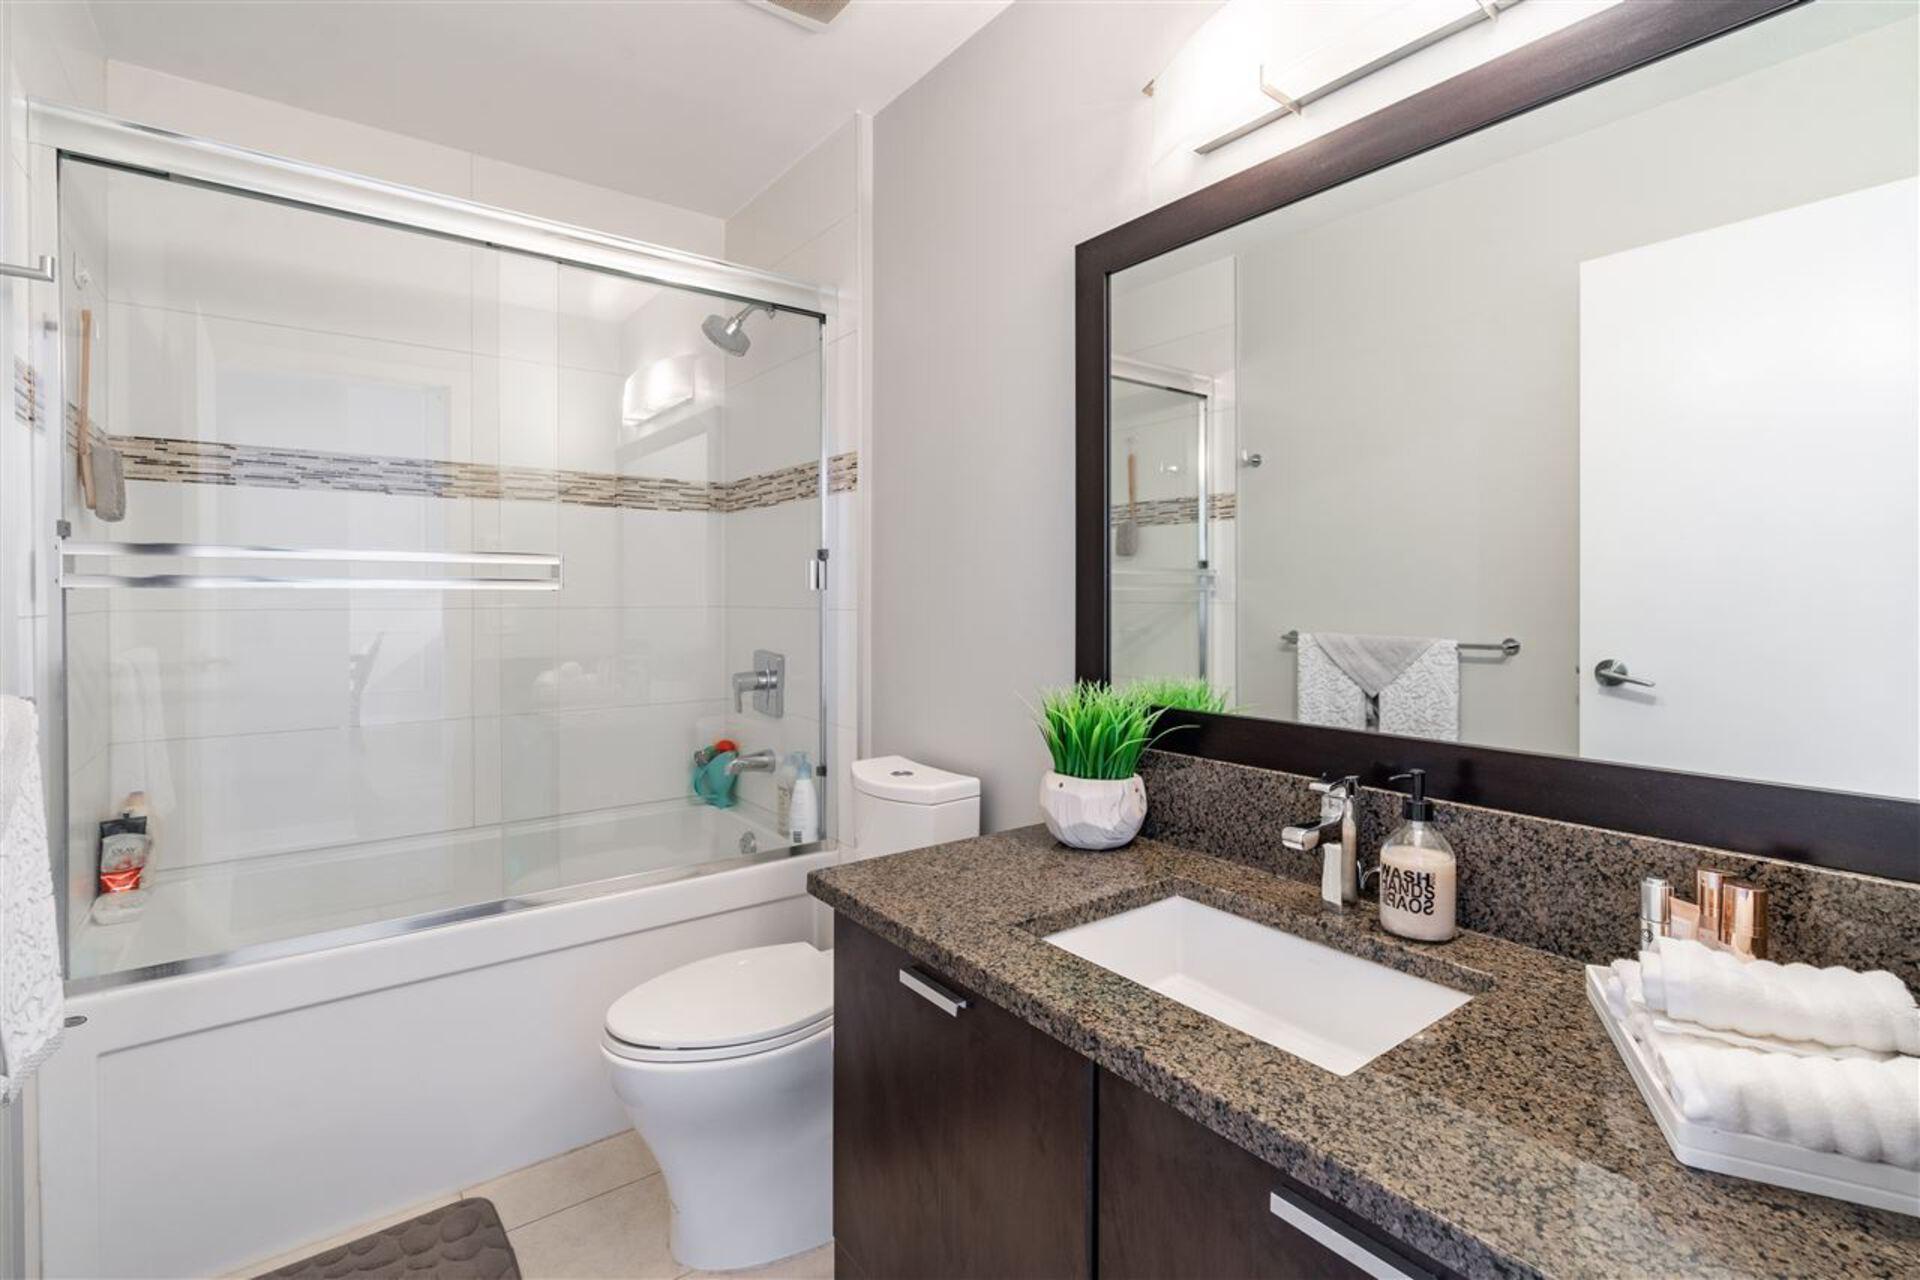 7511-120-street-scottsdale-n-delta-13 at 418 - 7511 120 Street, Scottsdale, N. Delta